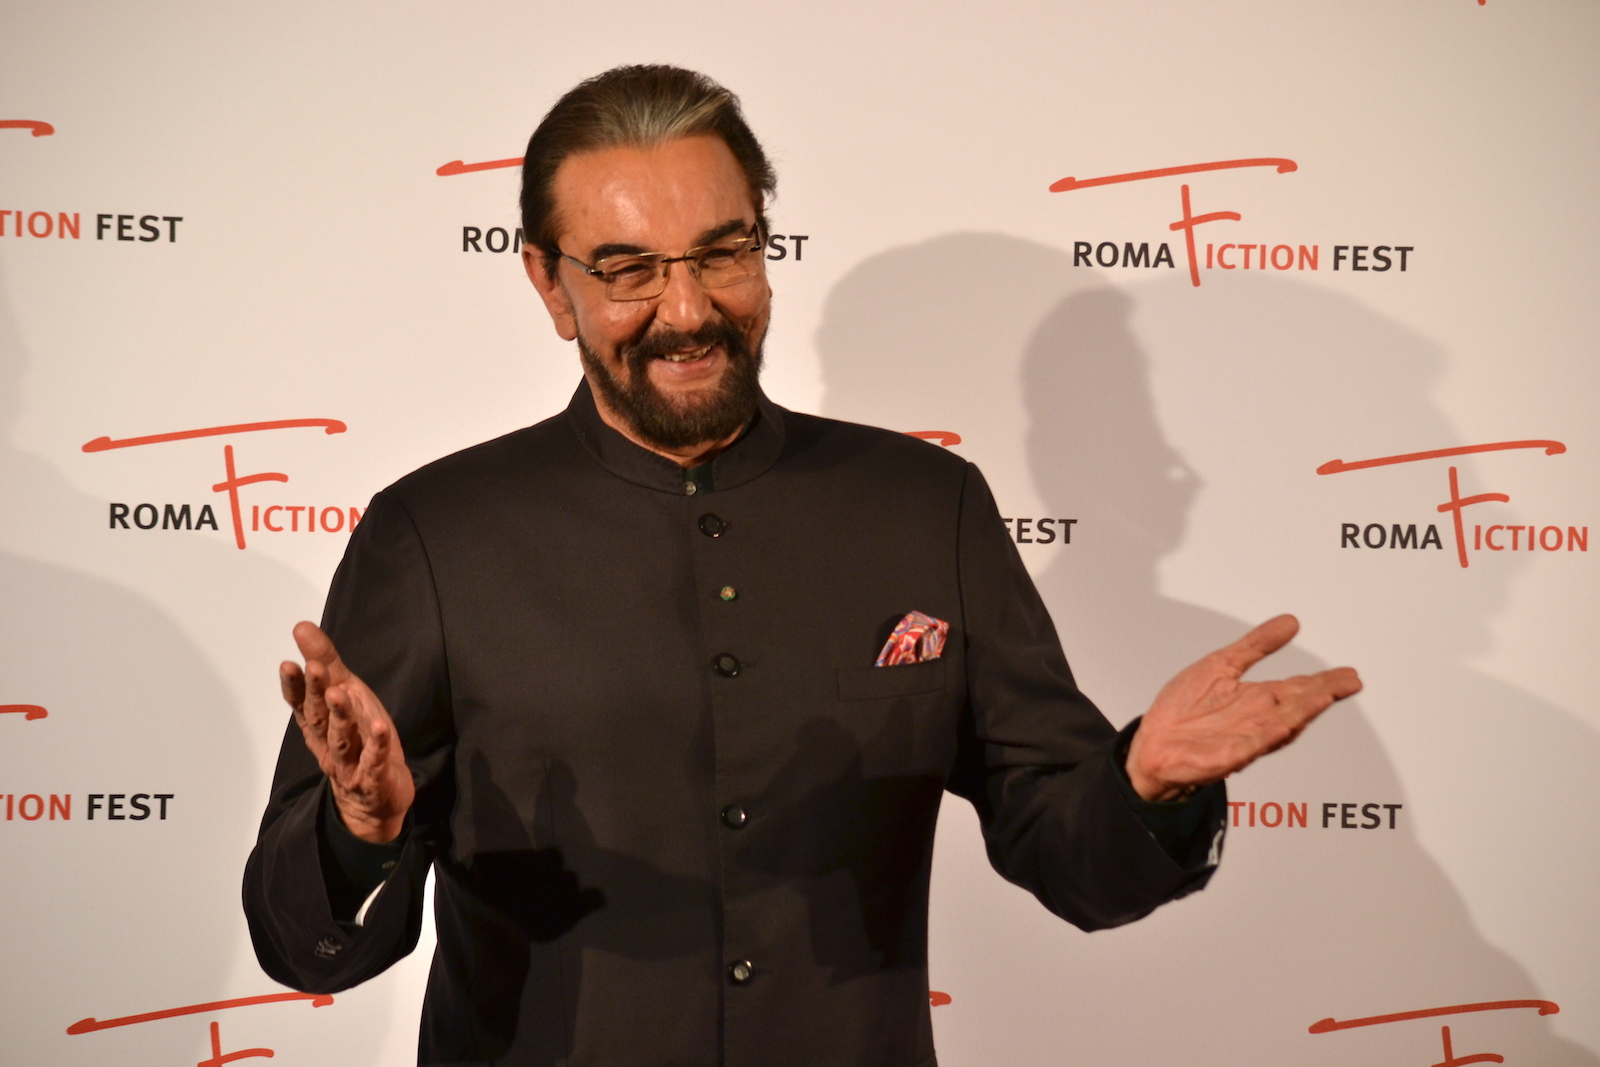 Roma Fiction Fest 2015: Kabir Bedi sorride ai fotografi sul red carpet di Sandokan